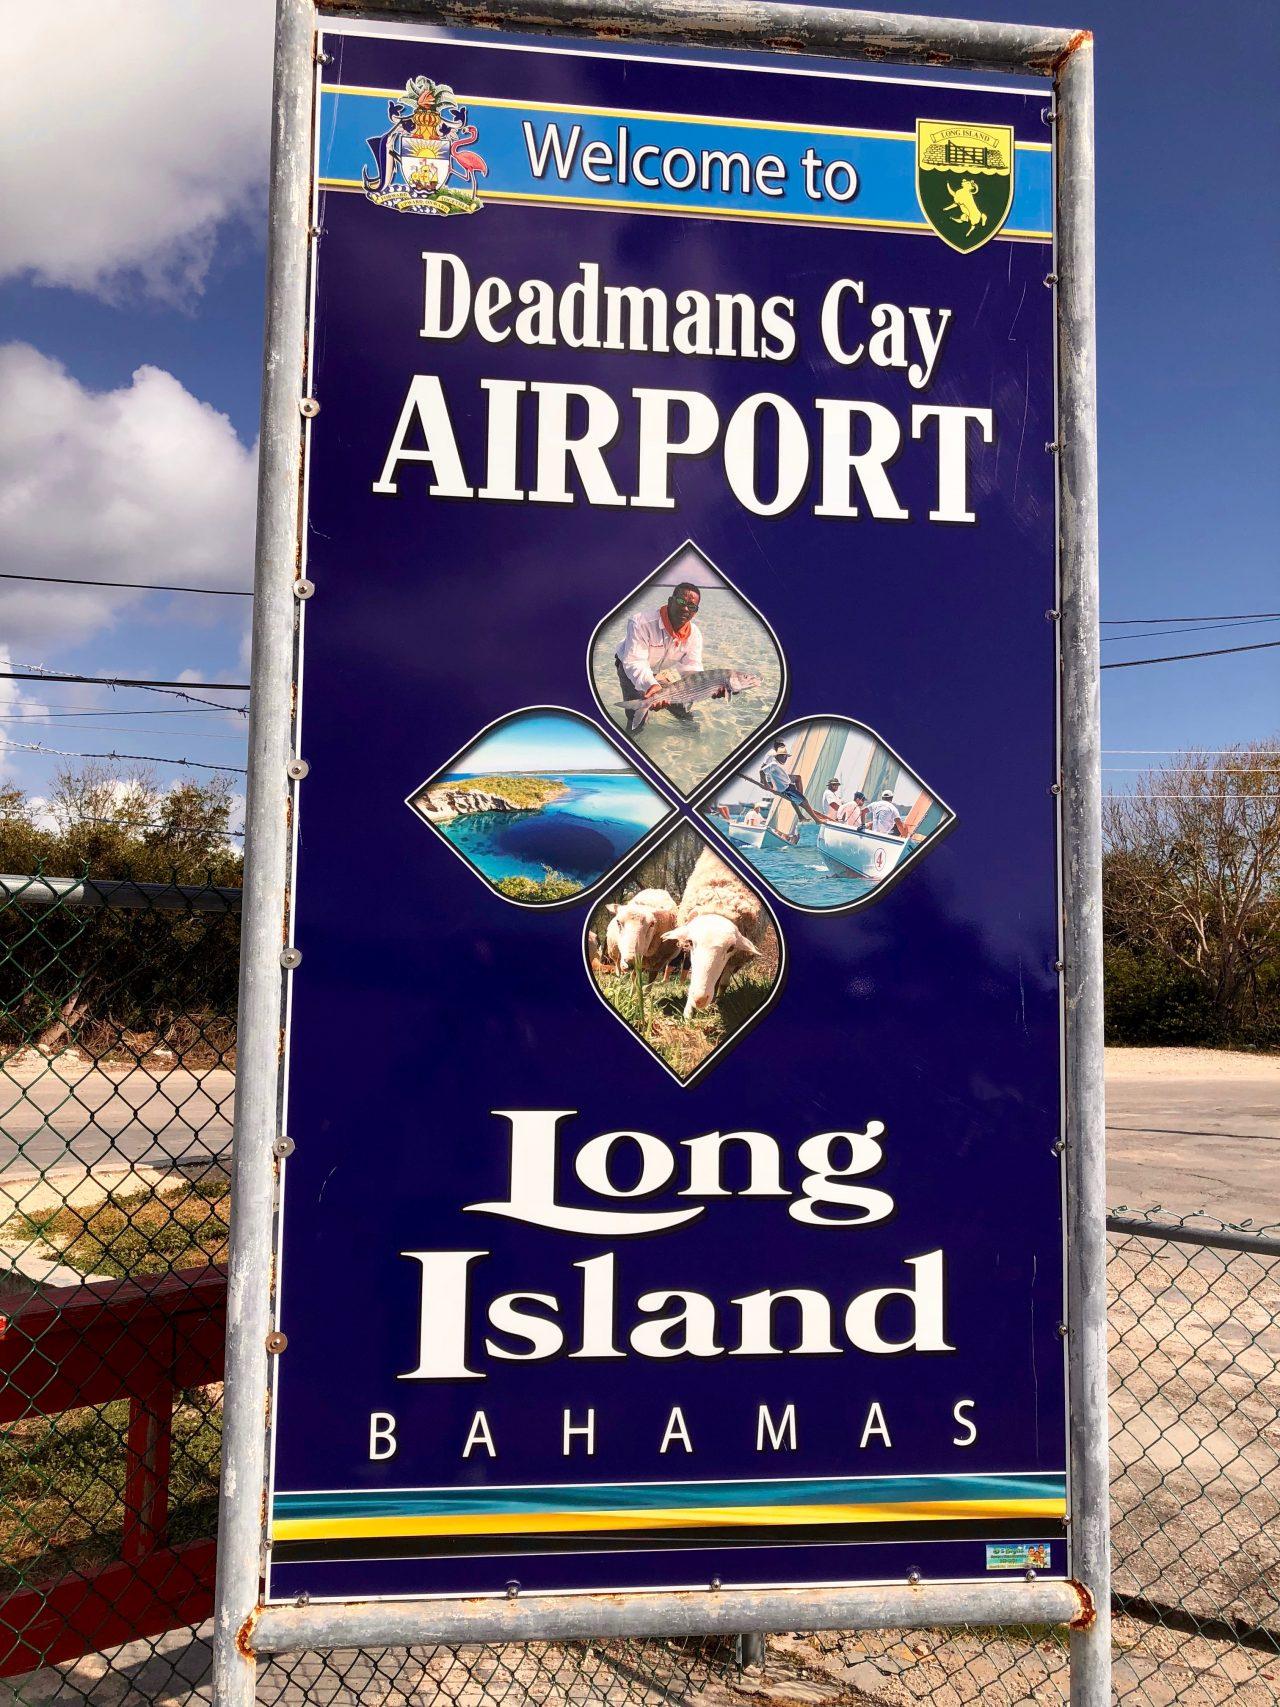 Deadmans Cay Airport